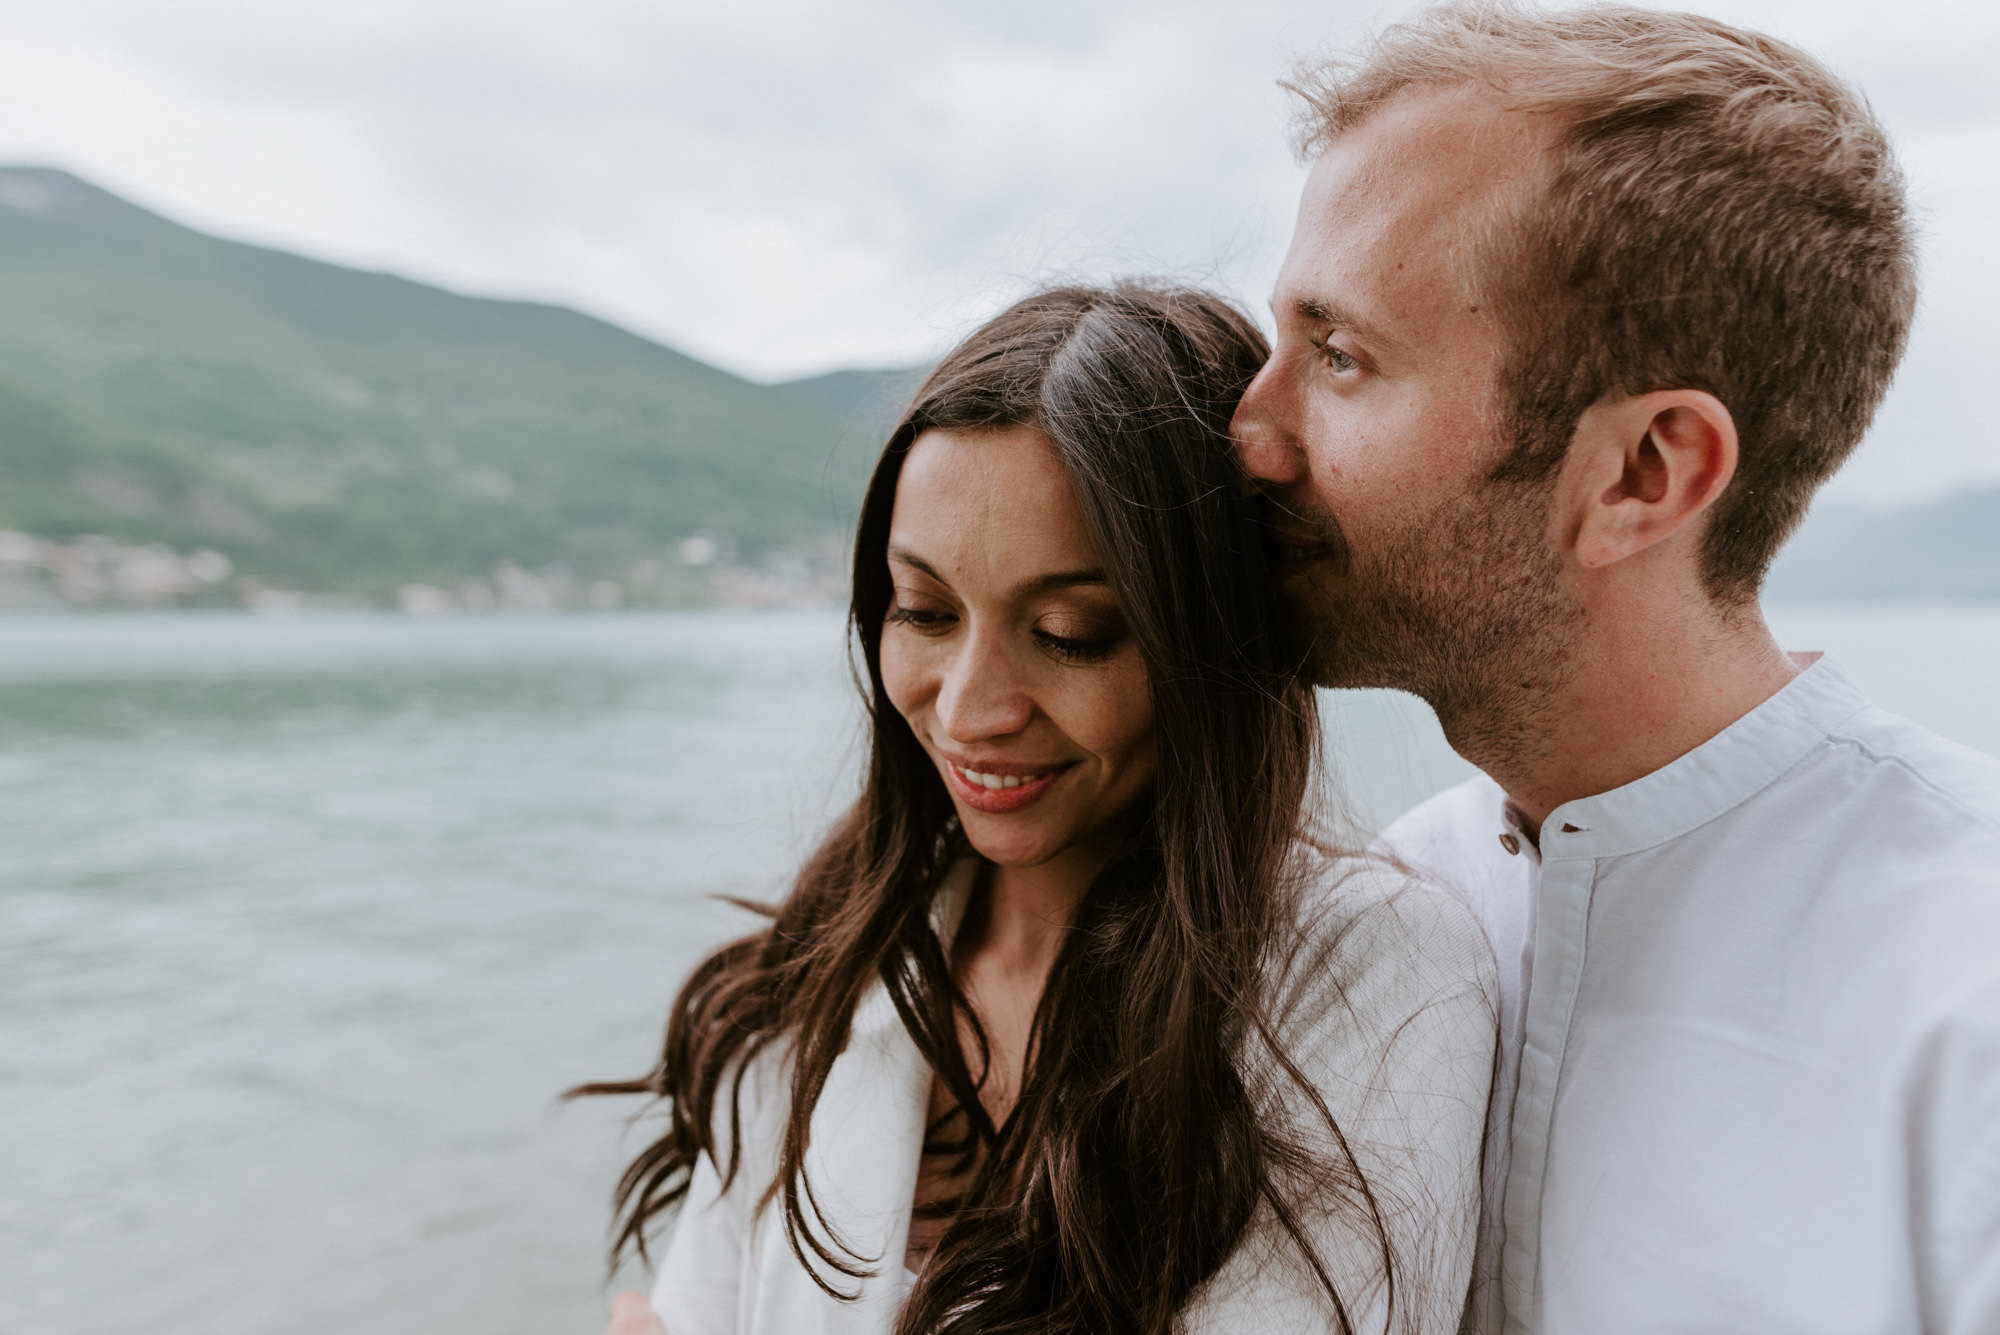 FOTO+PHOTO+BODA+WEDDING+ITALIA+ITALY+MAURICIO+GARAY+MAURICIOGARAY+WEDDINPHOTOGRAPHER+FOTOGRAFODEBODA-2405.jpg